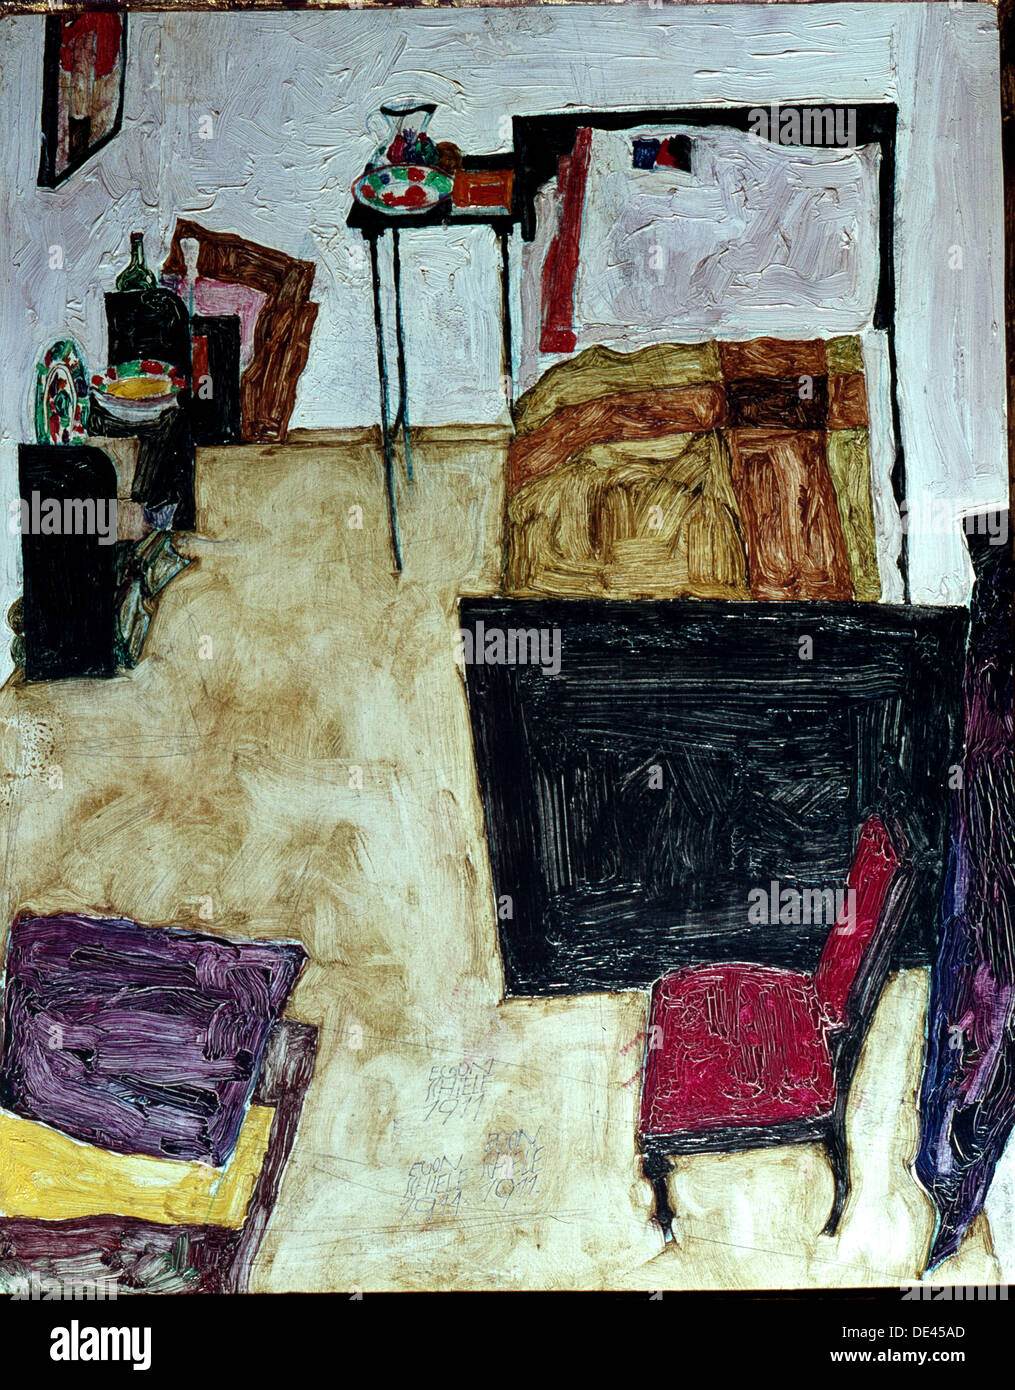 Mein Wohnzimmer Painting By Egon Schiele Stock Photo 60328309 Alamy